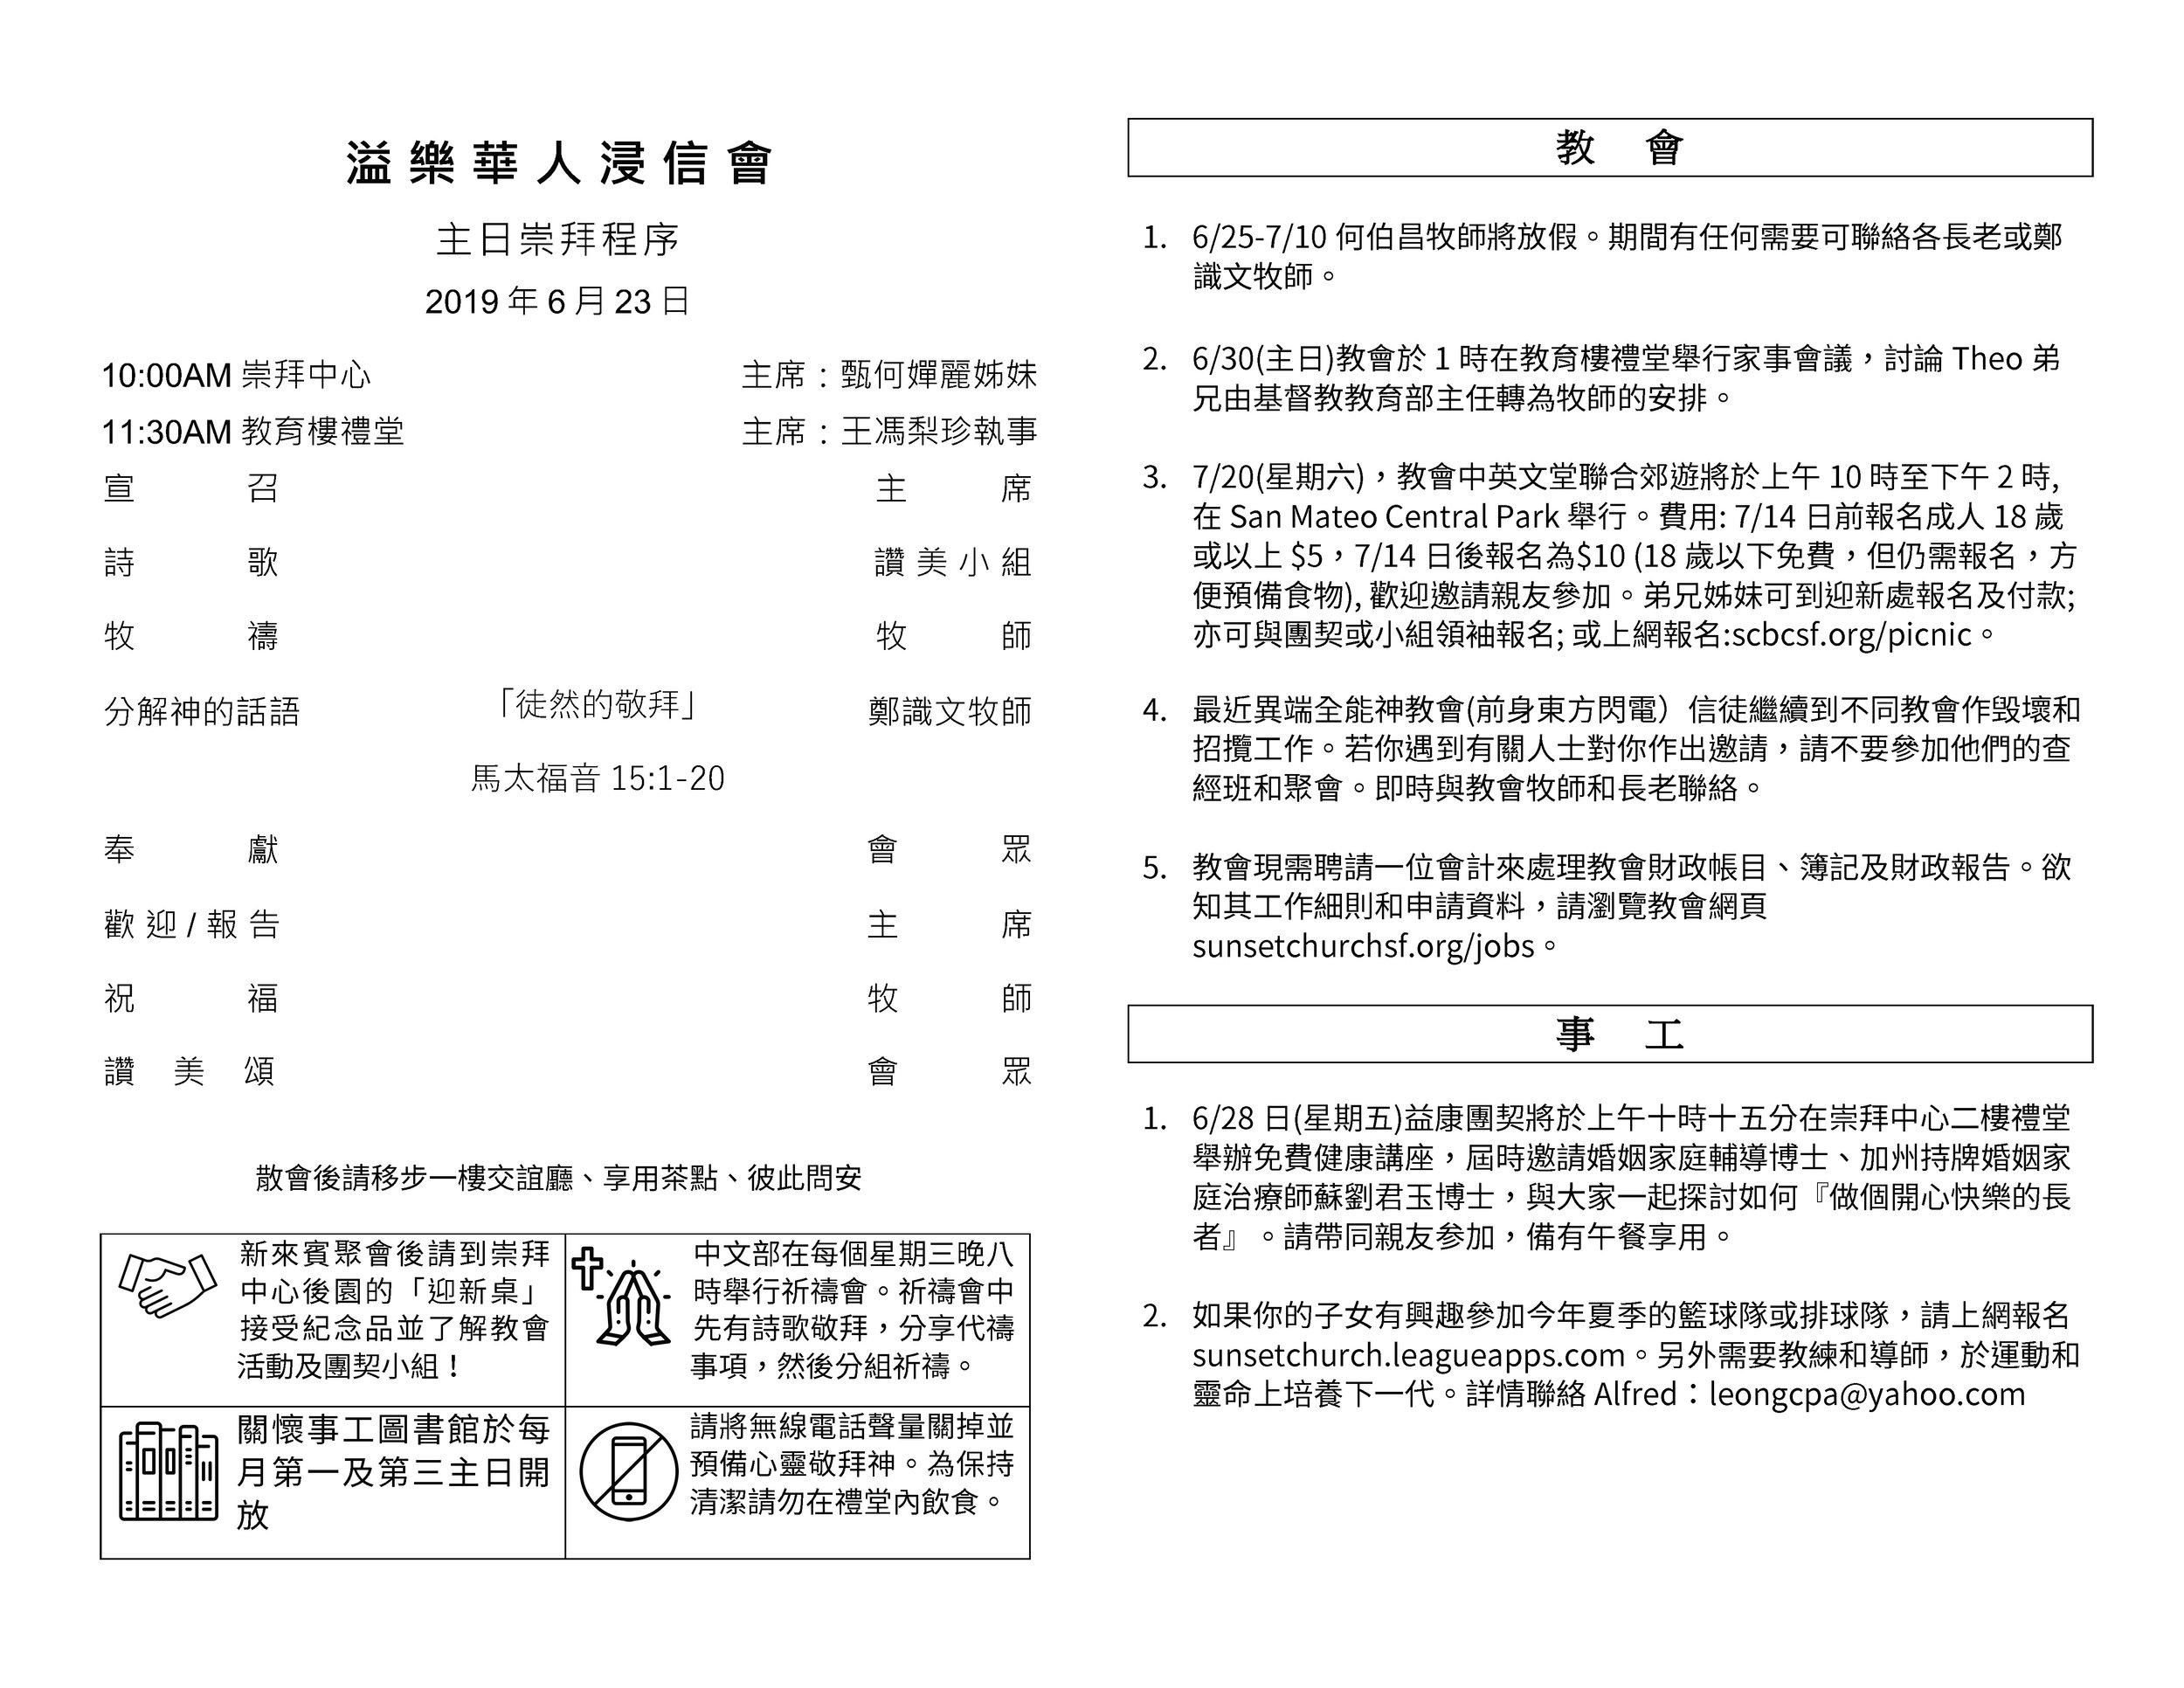 Chinese Bulletin 2019-6-23_Page_2.jpg